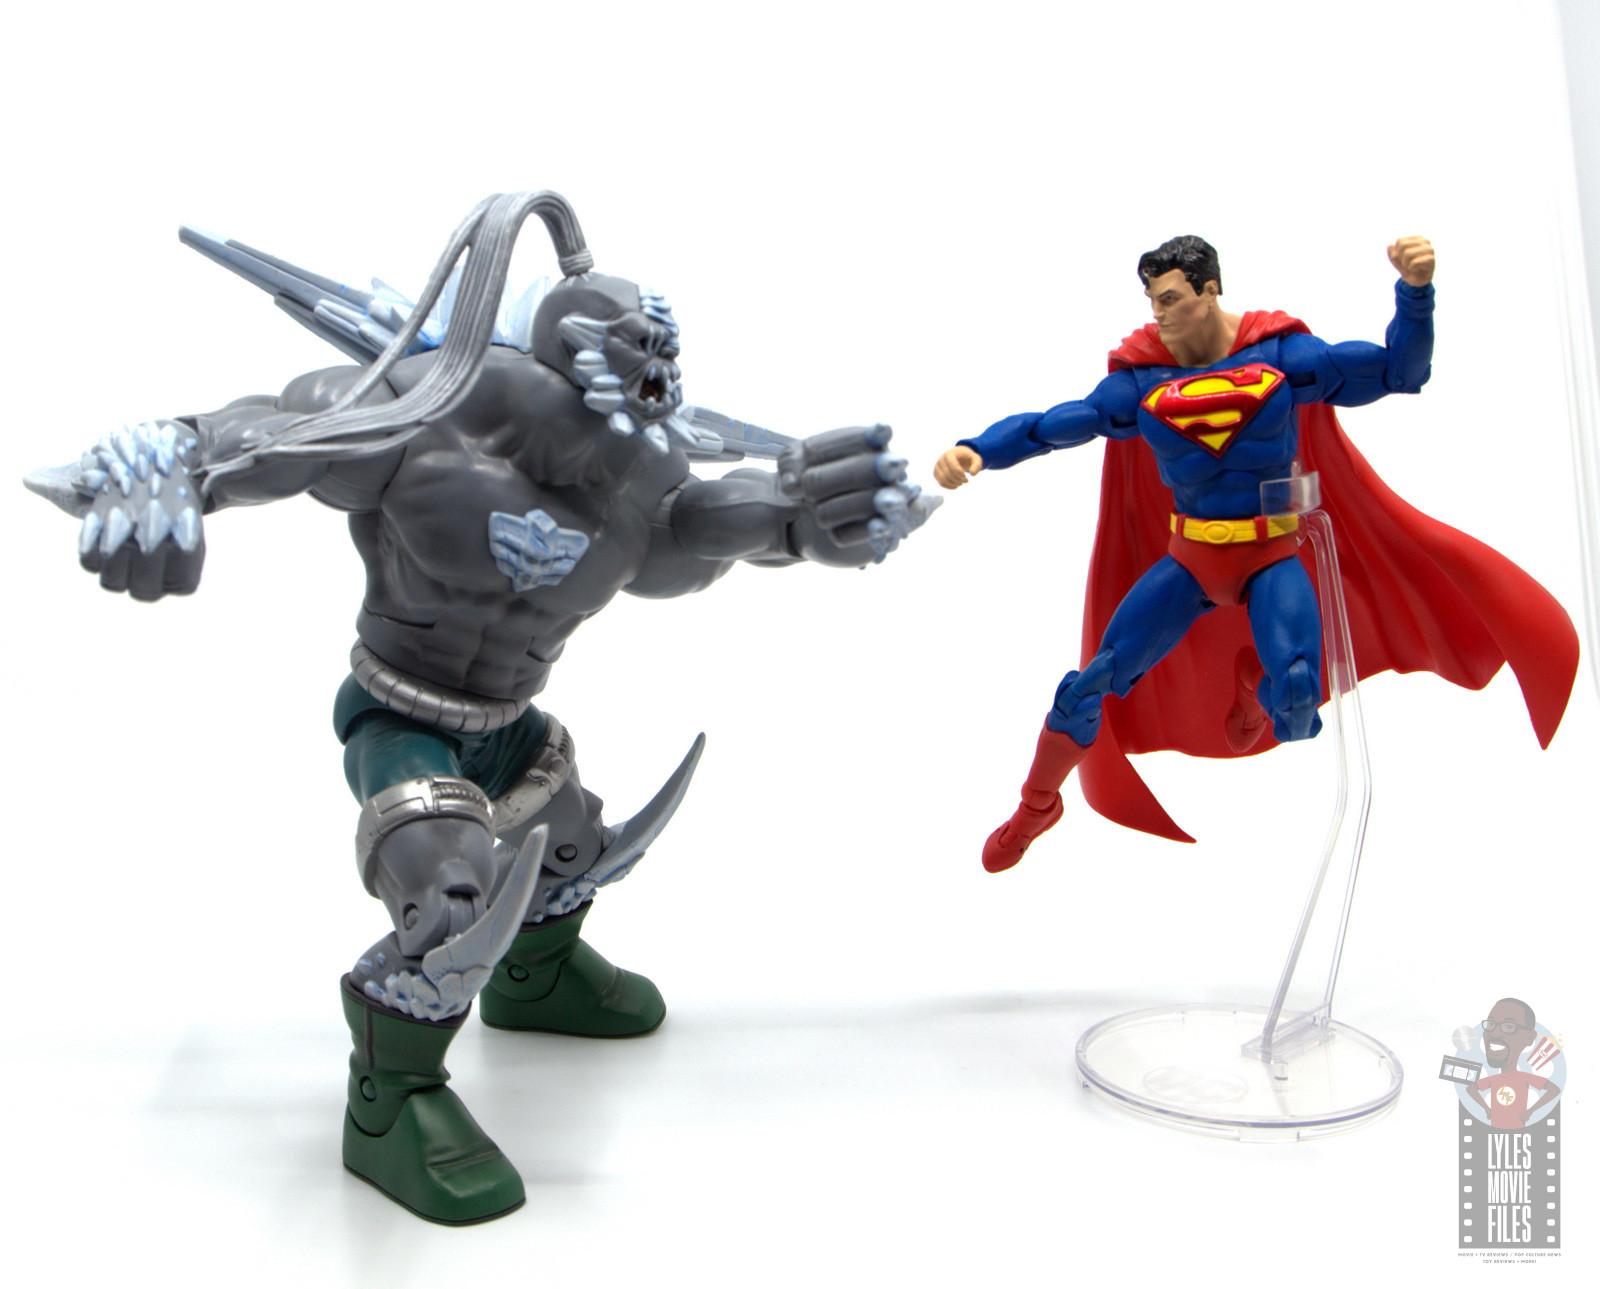 Mcfarlane Toys Dc Multiverse Superman Figure Review Vs Doomsday